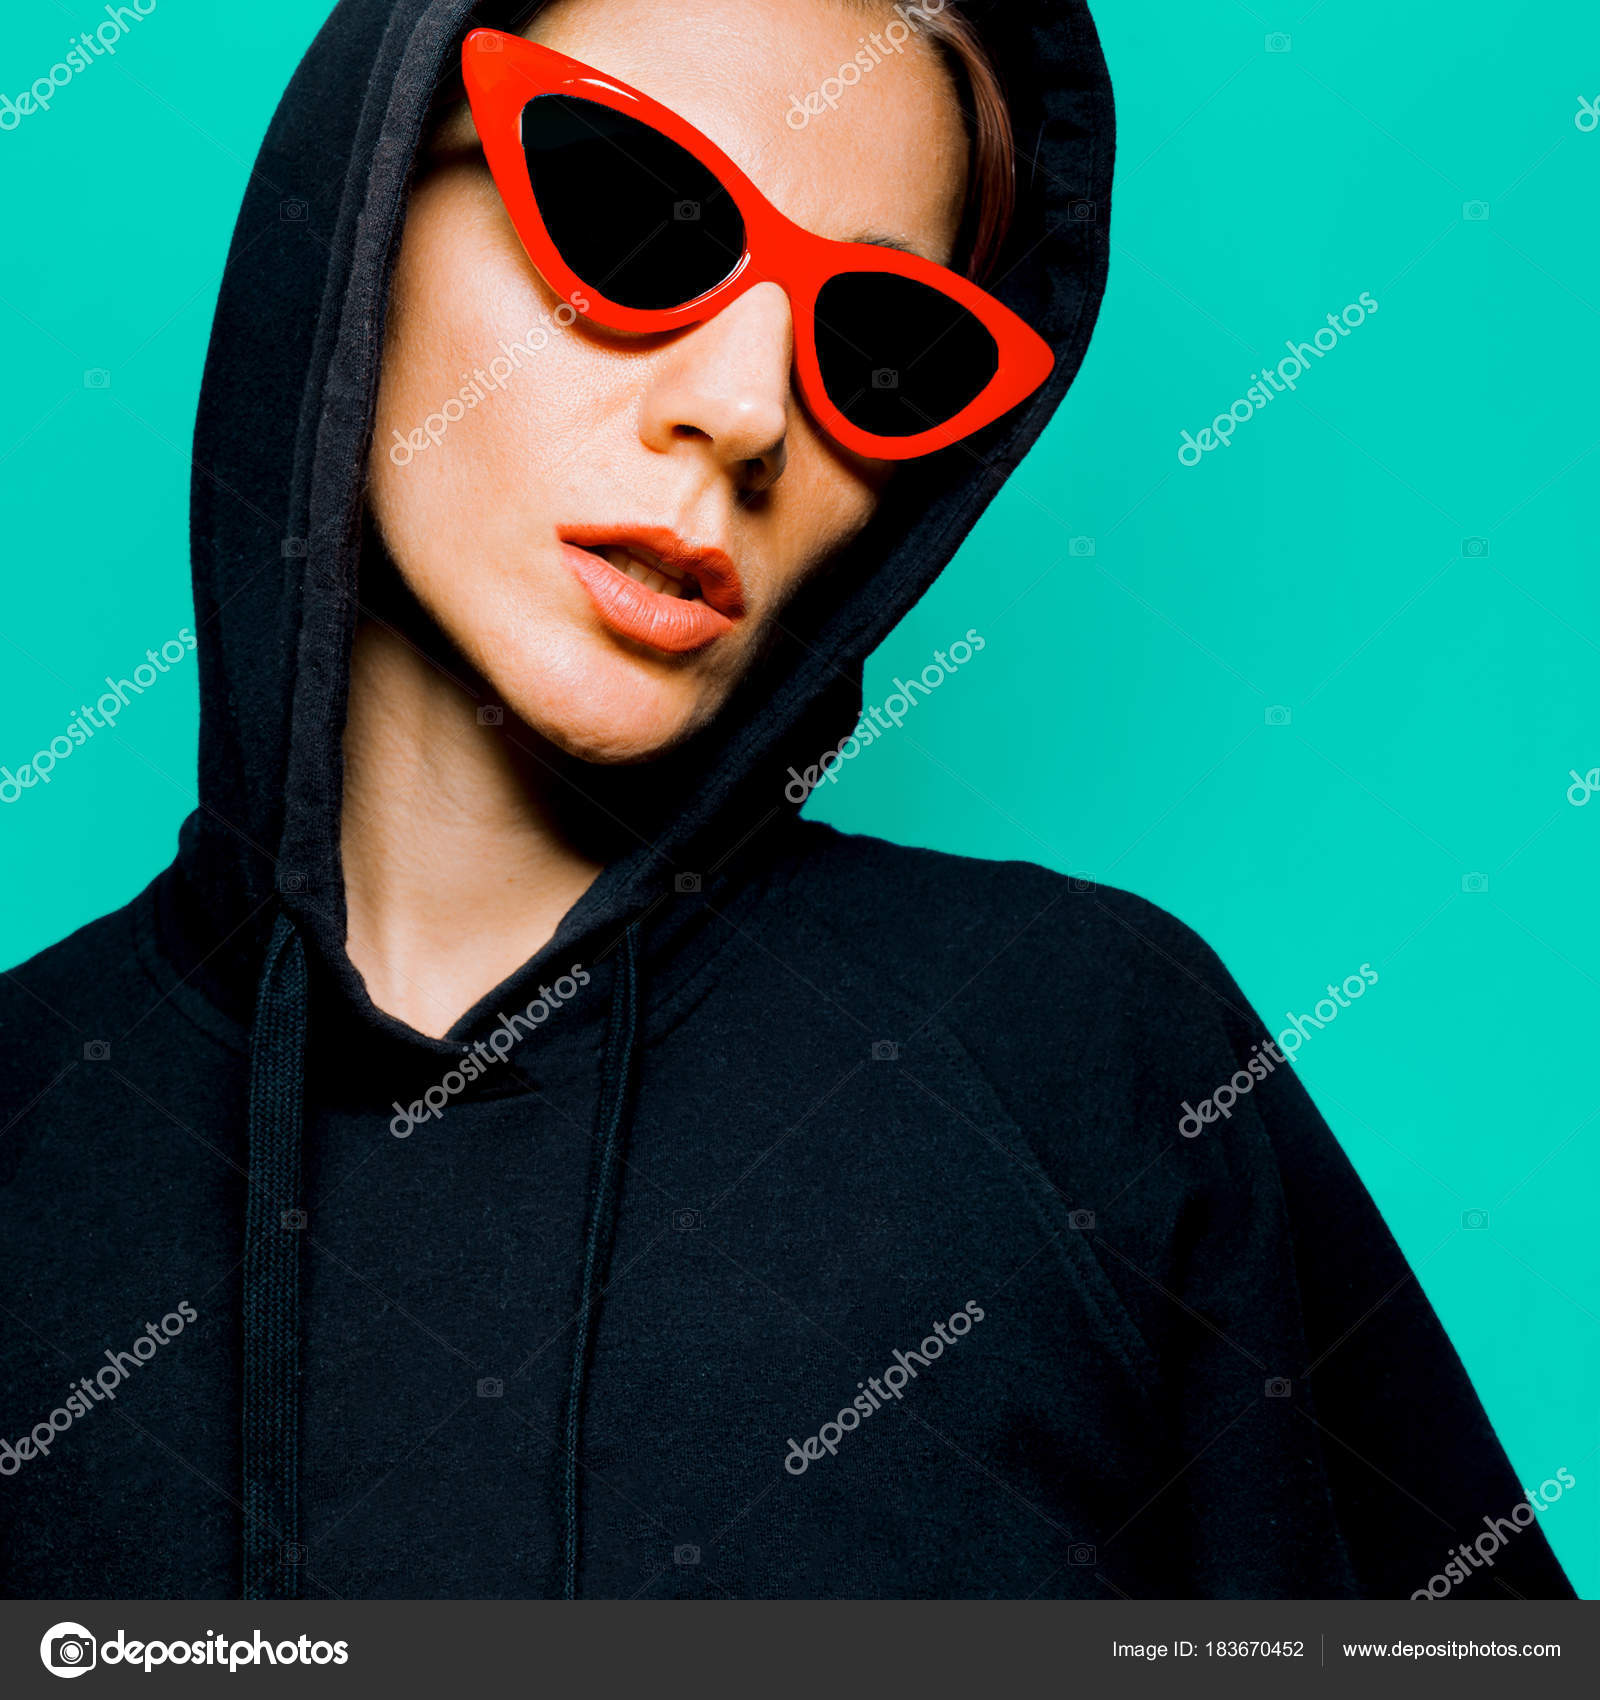 aa806a16f Moleca em óculos de sol moda estilo urbano de Swag de roupa de rua —  Fotografia